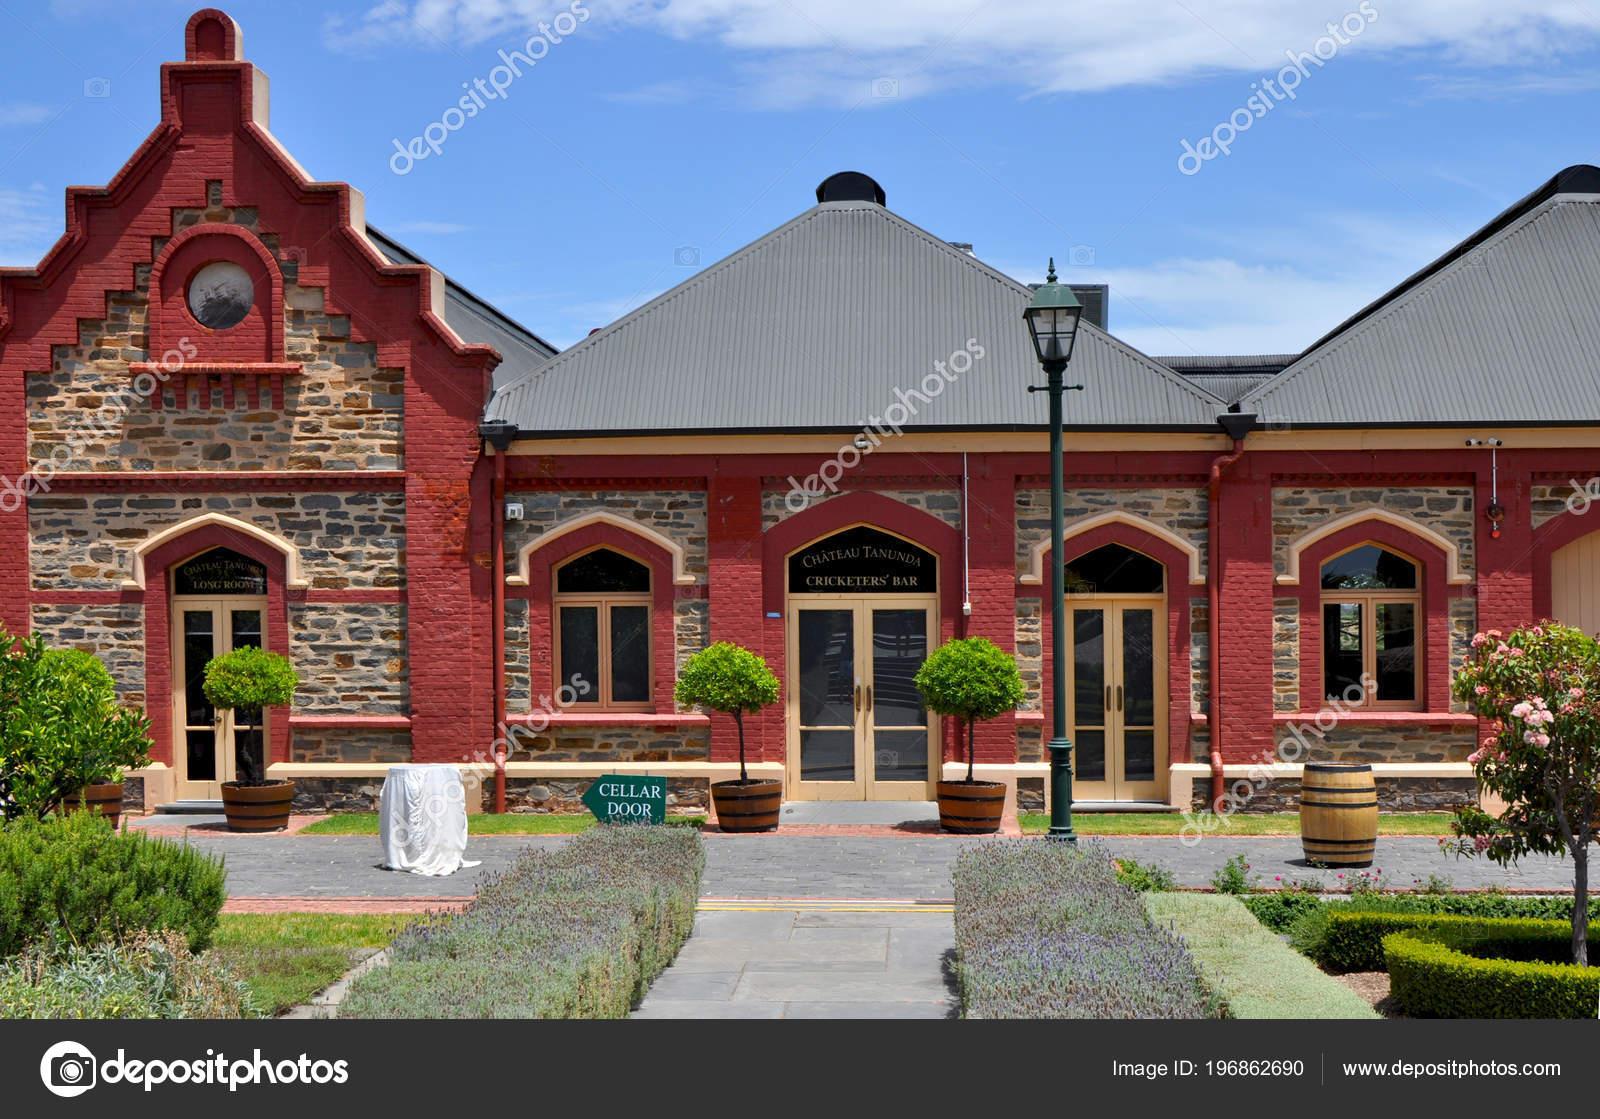 Australien Chateau Tanunda Keller Landwirtschaft Barossa Valley ...